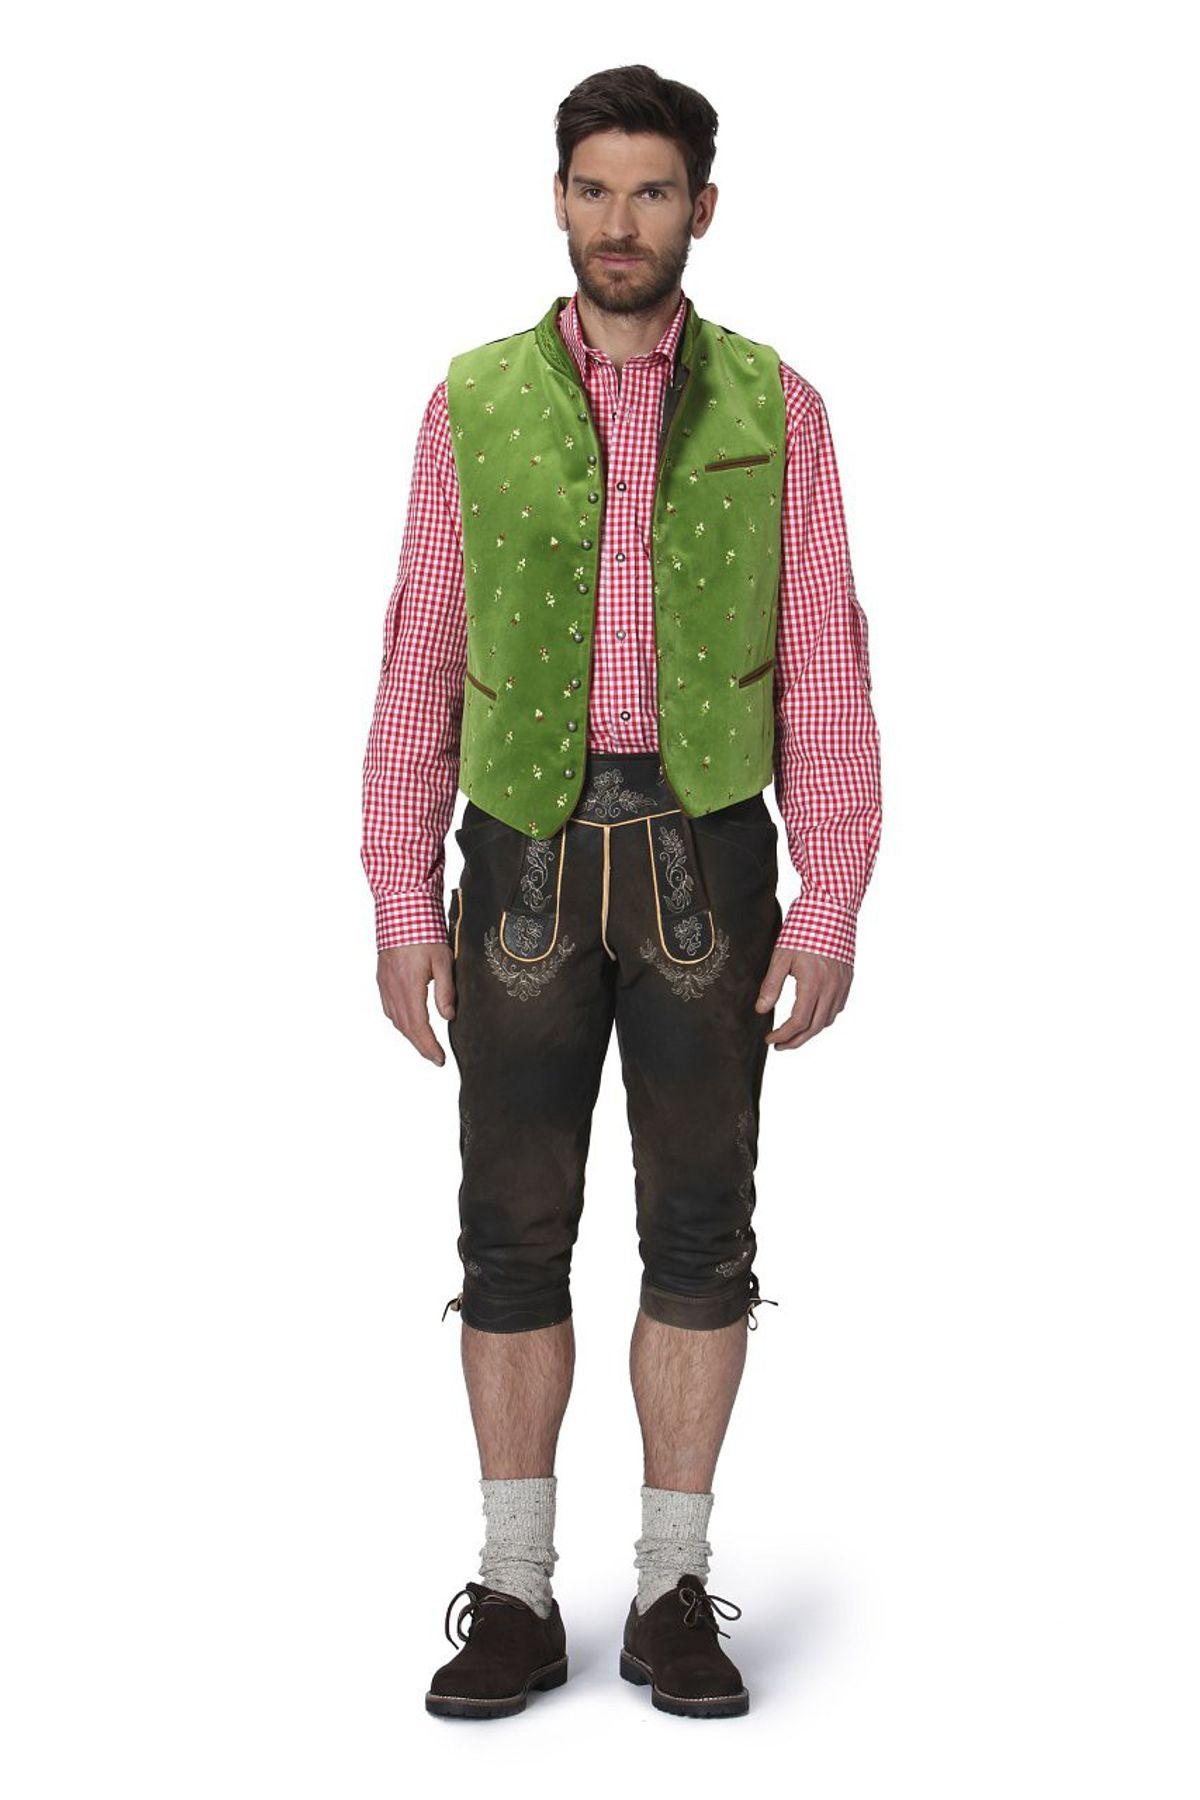 Stockerpoint - Herren Trachten Weste in verschiedenen Farbtönen, Calzado – Bild 12